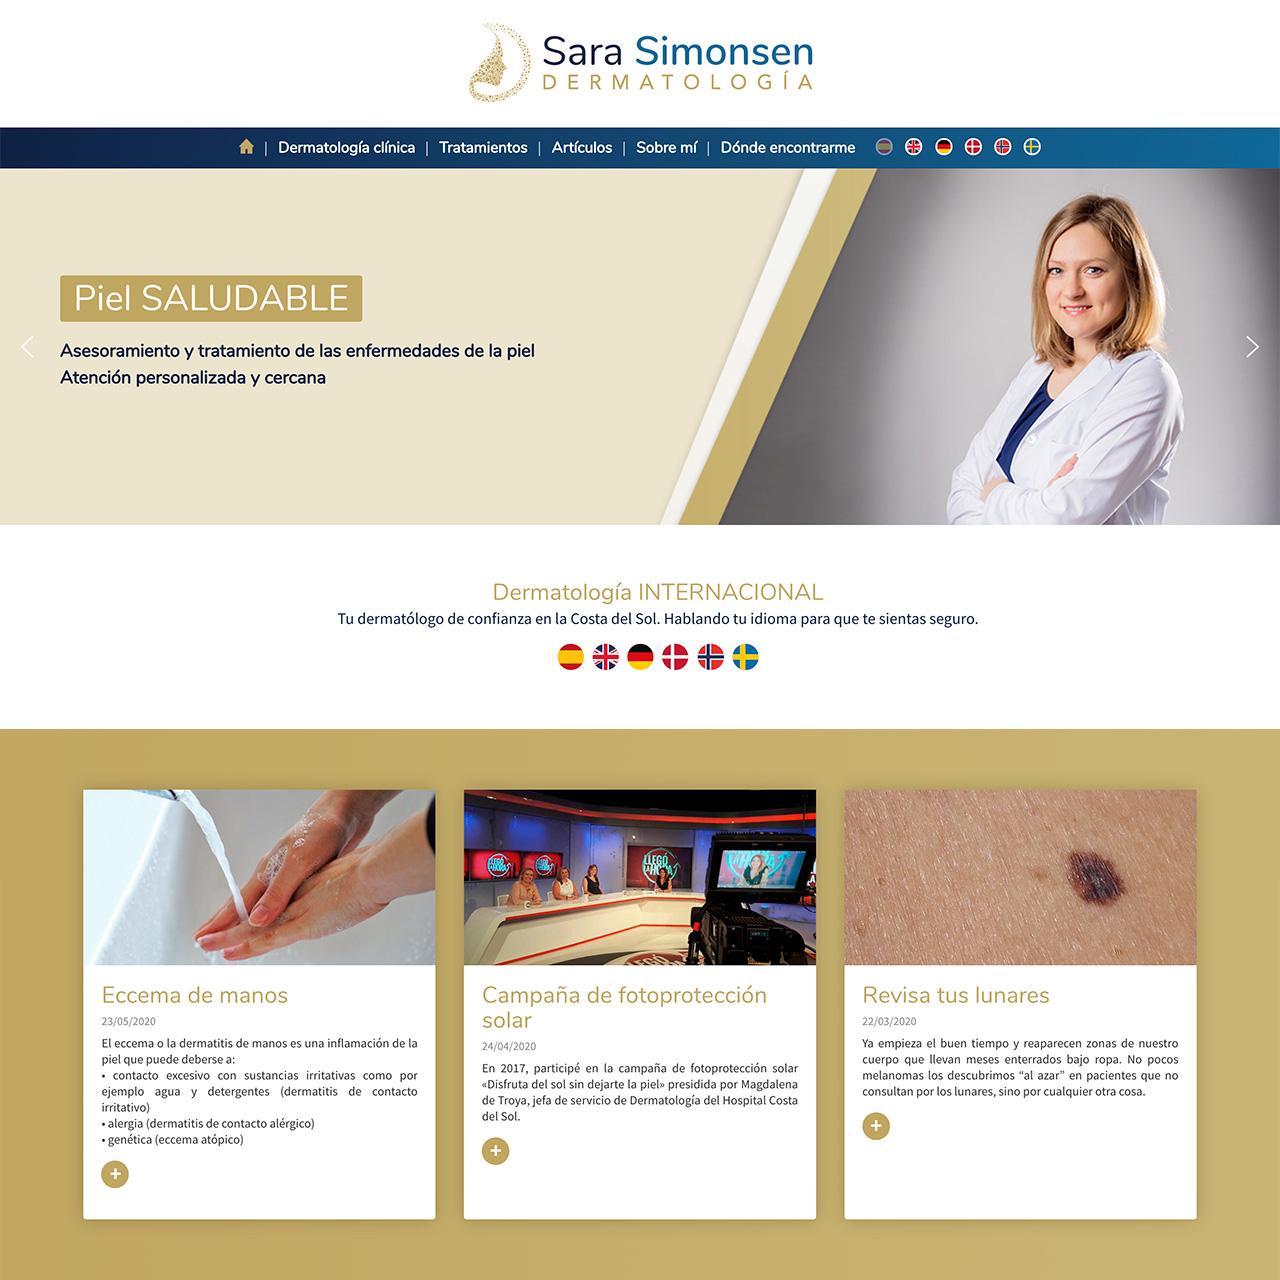 Sara Simonsen Dermatología